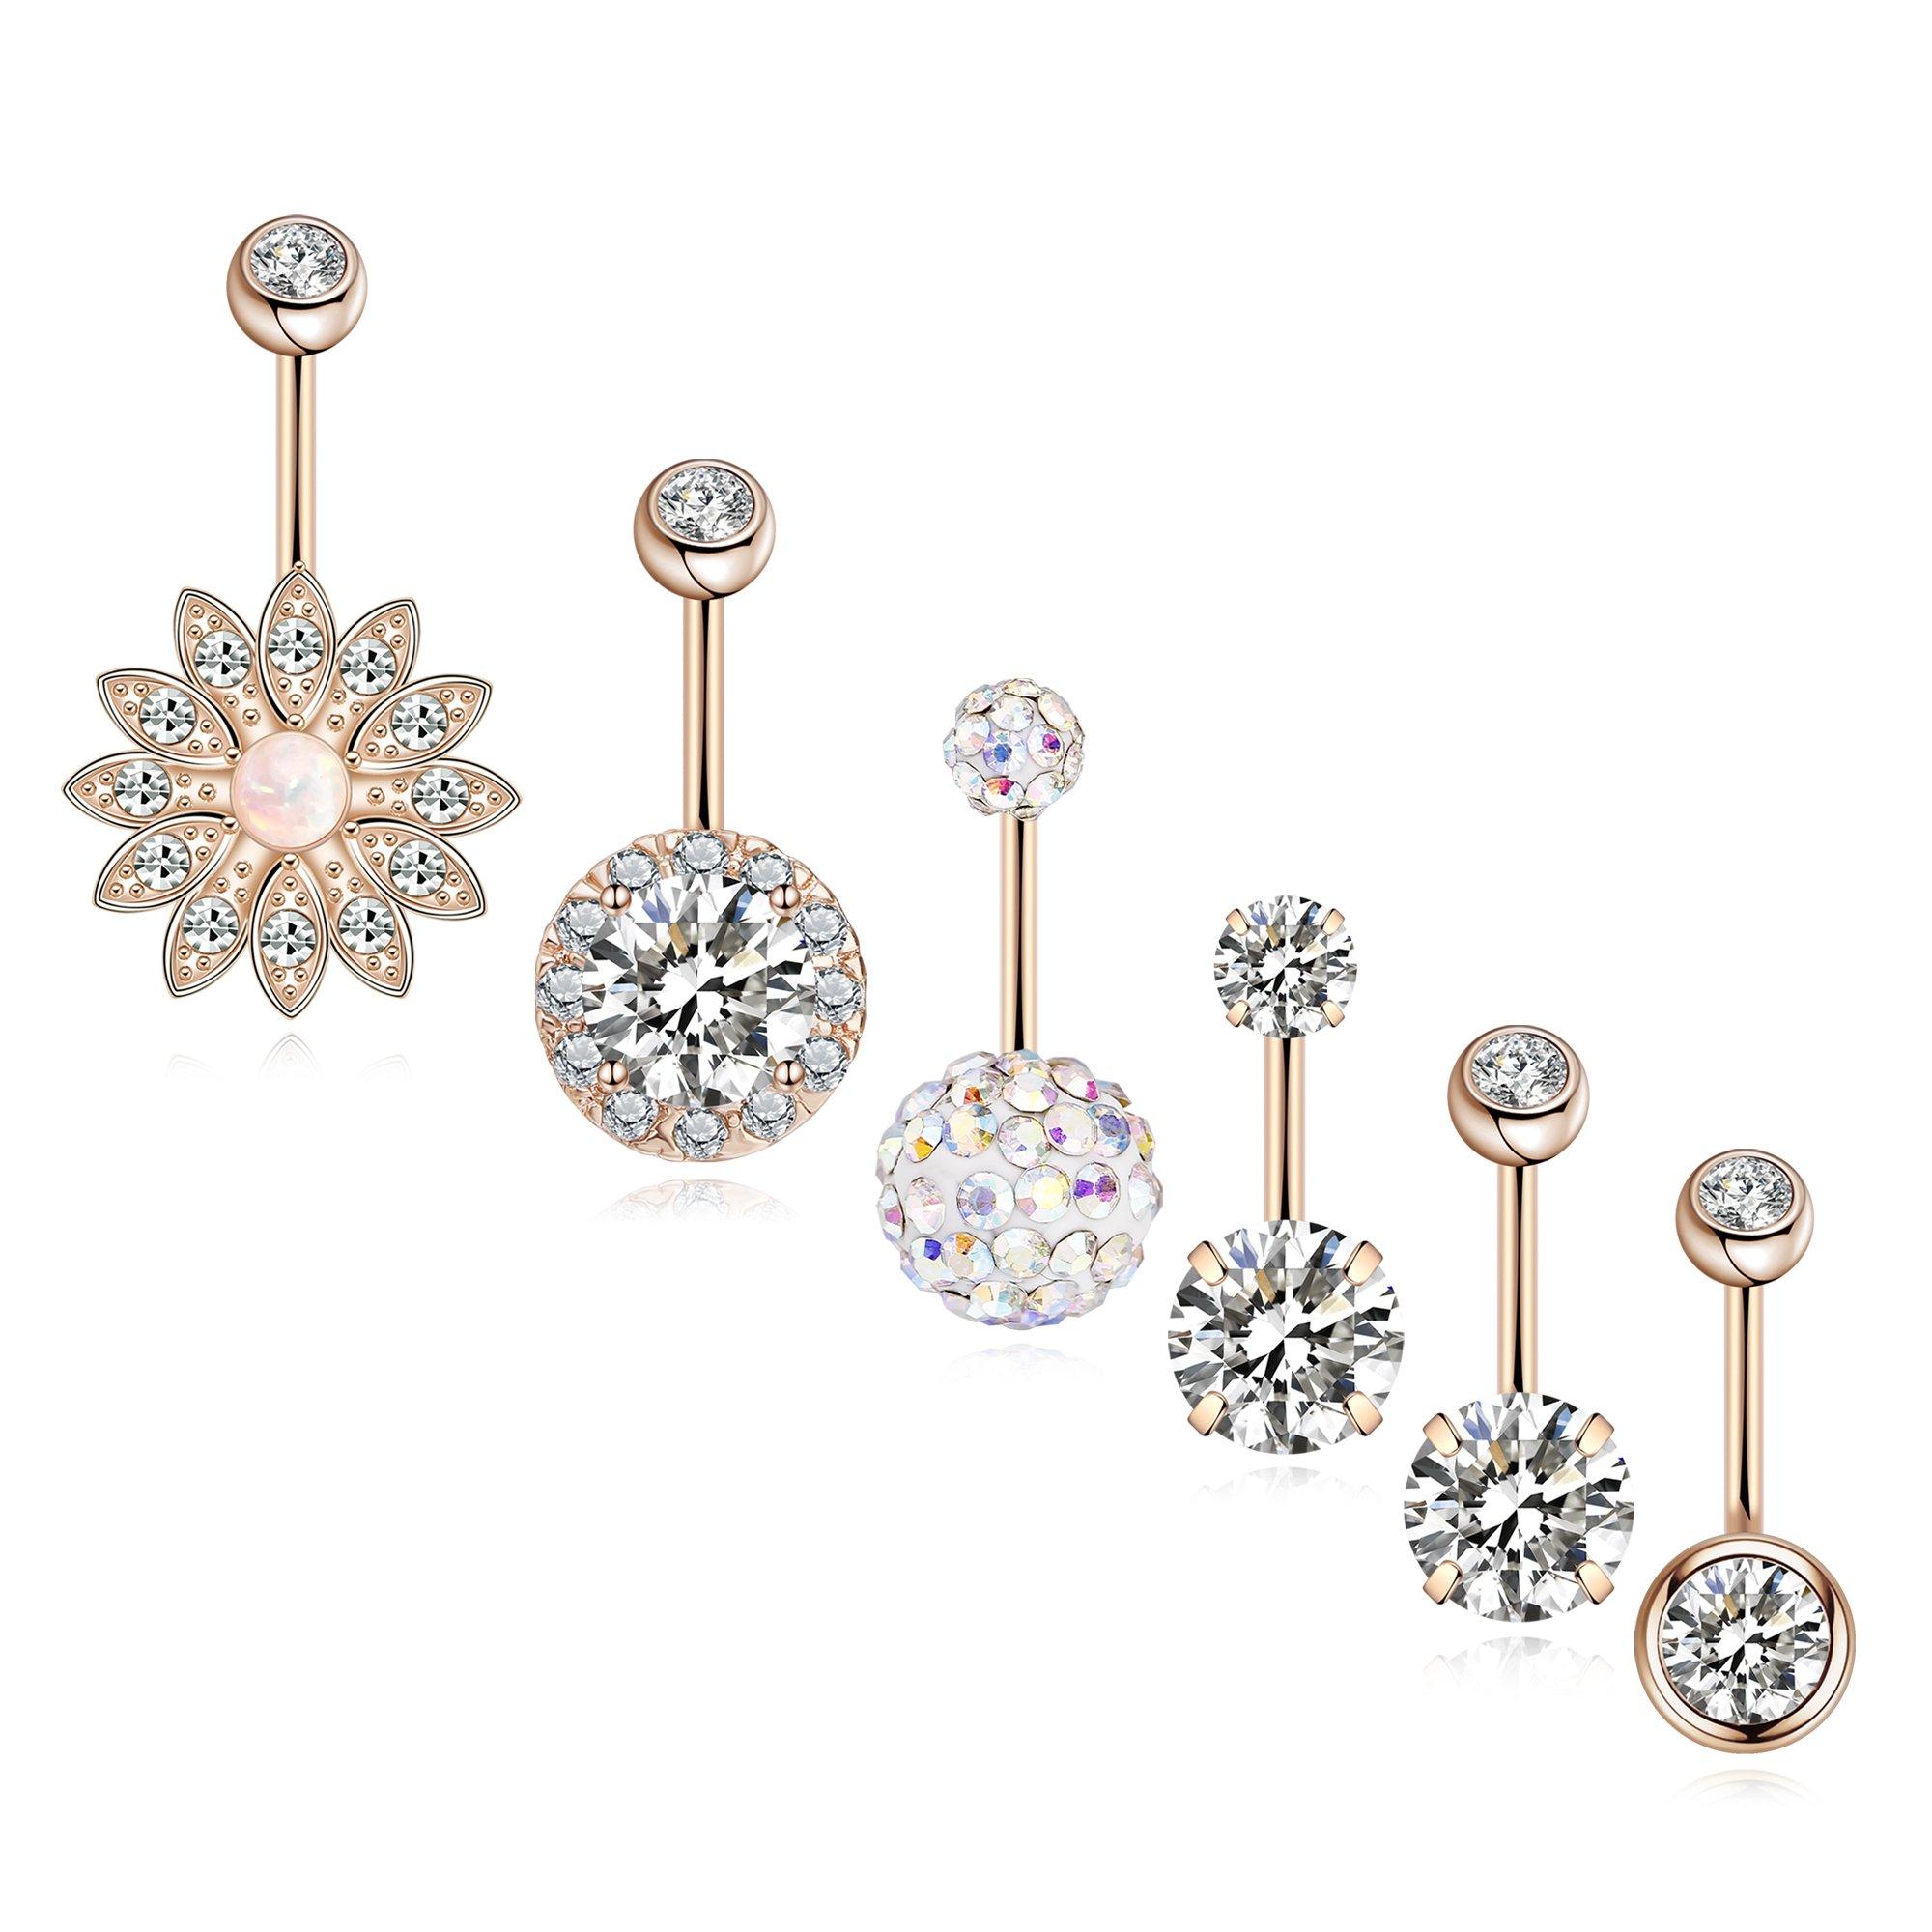 SEVENSTONE 6PCS Stainless Steel Belly Button Rings for Girls Women Screw Navel Piercing Bars Body Jewelry